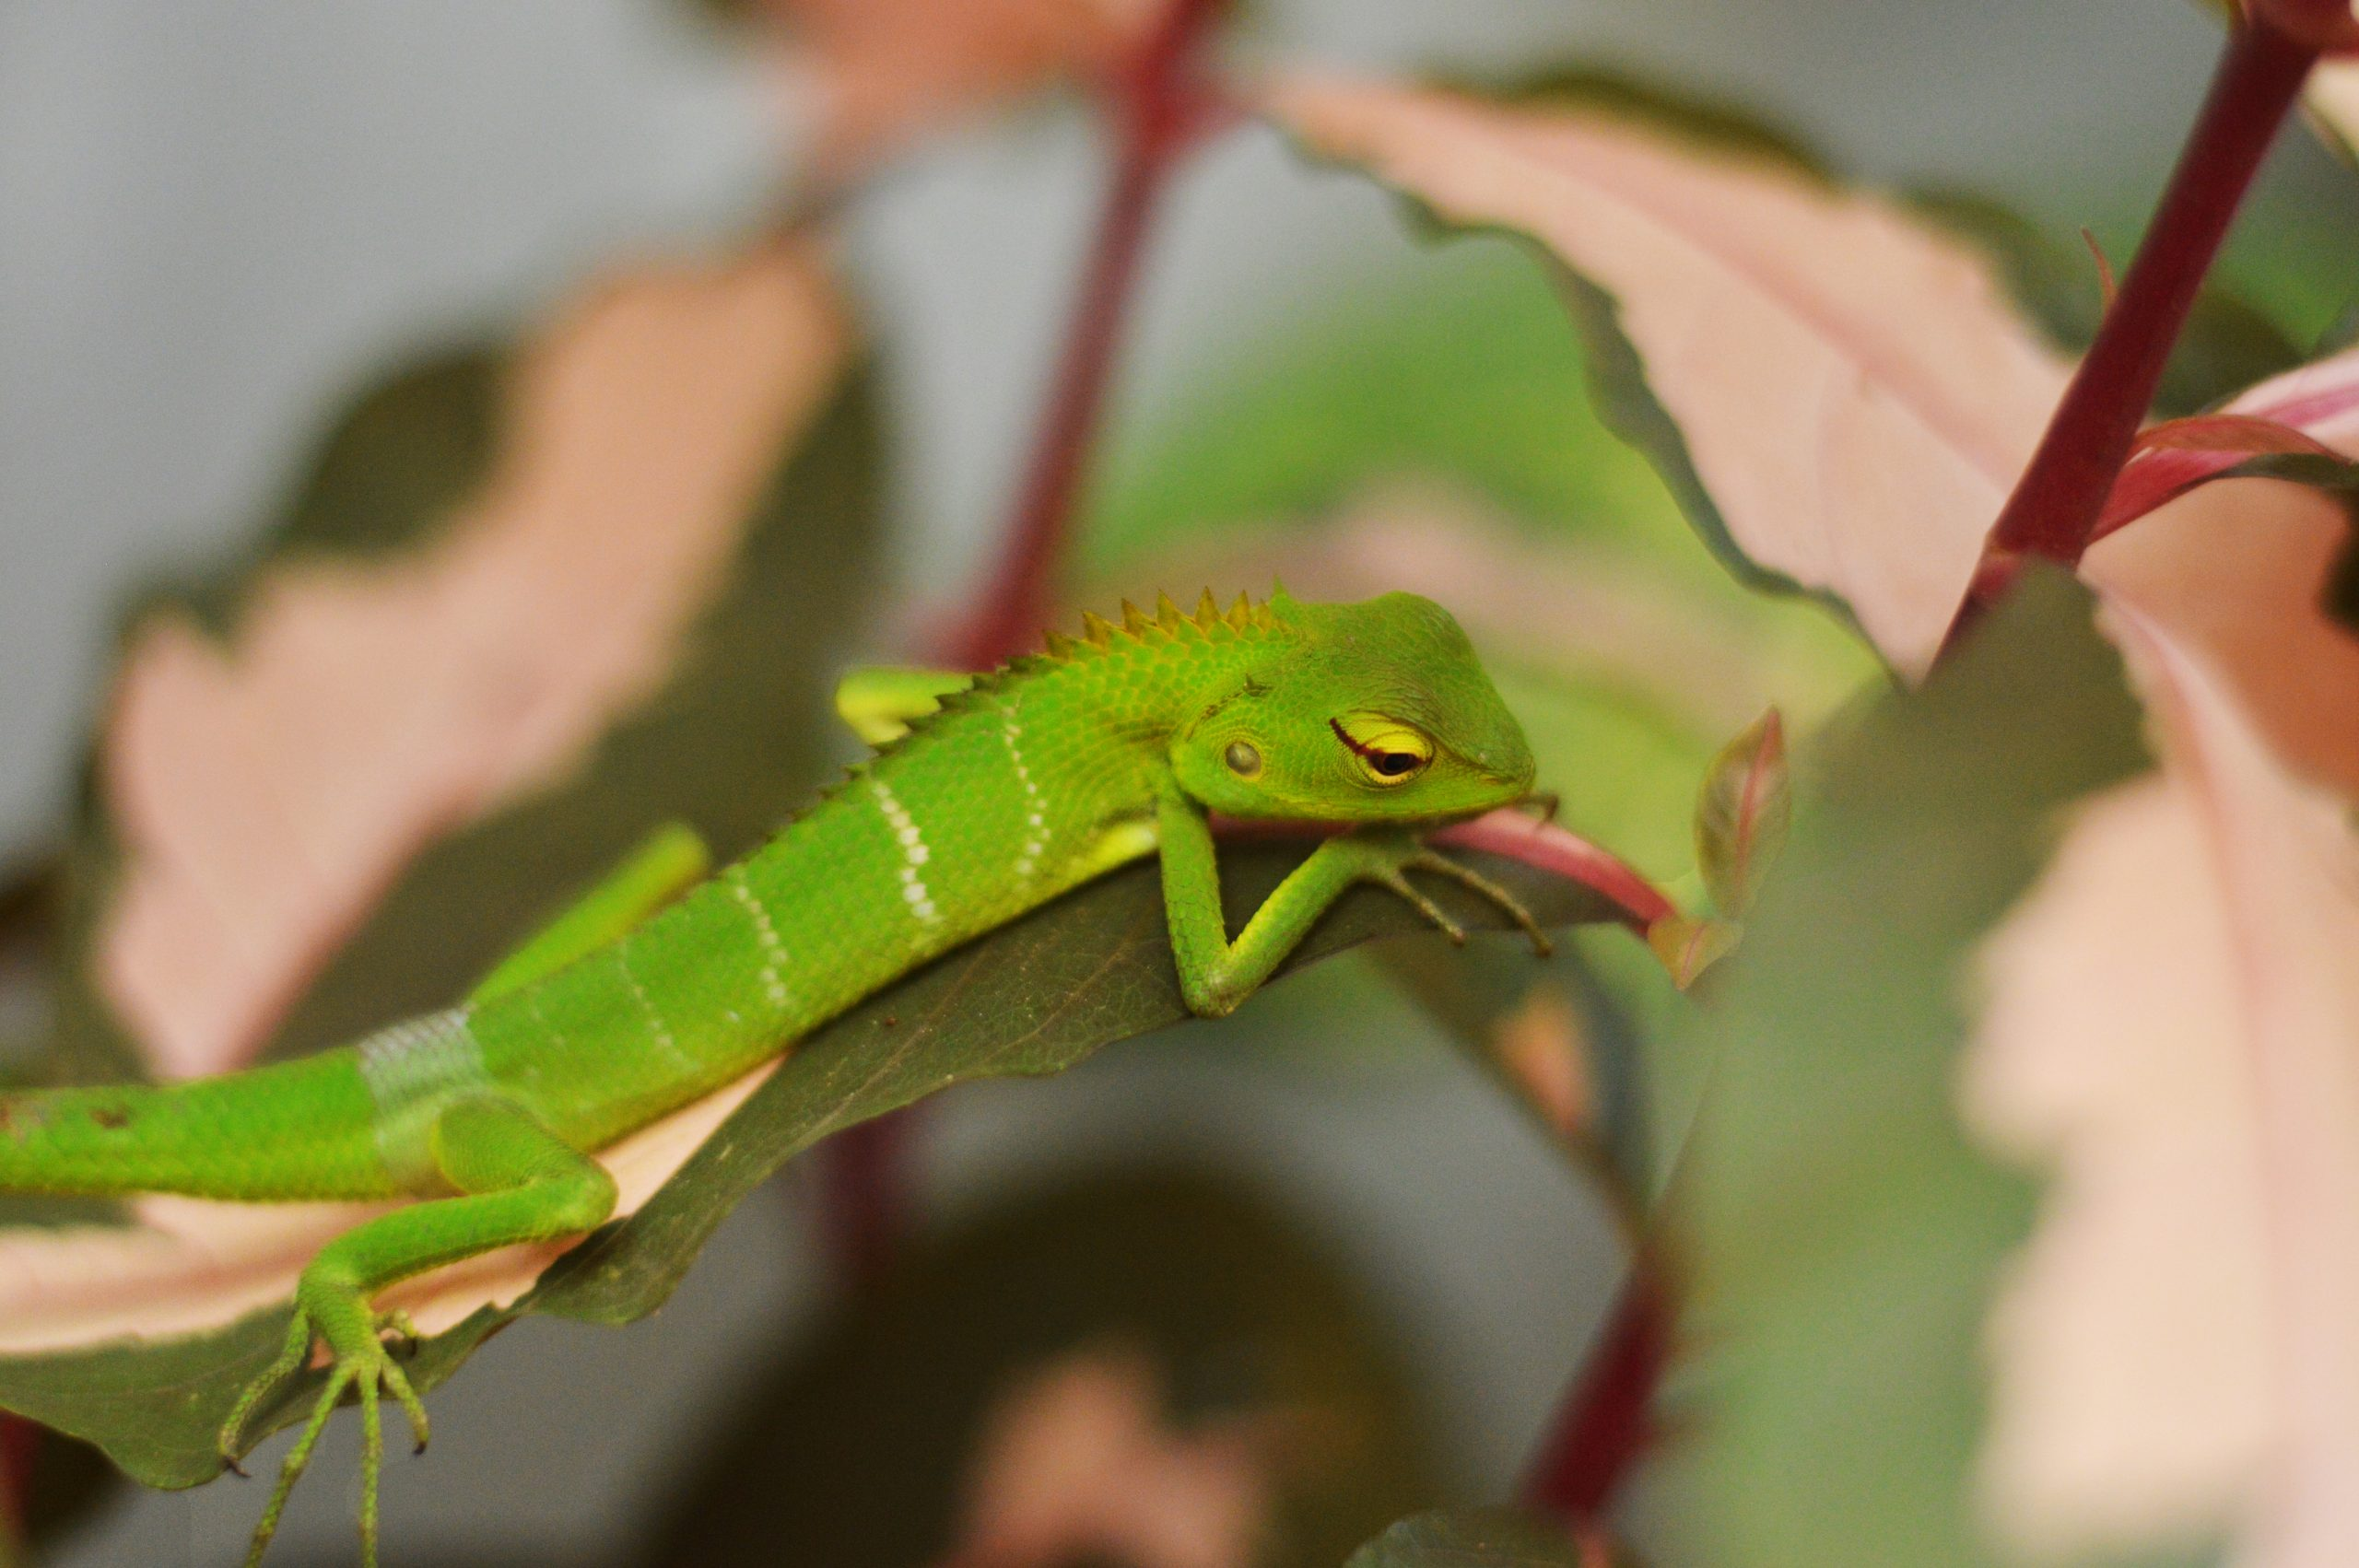 A garden lizard on a plant